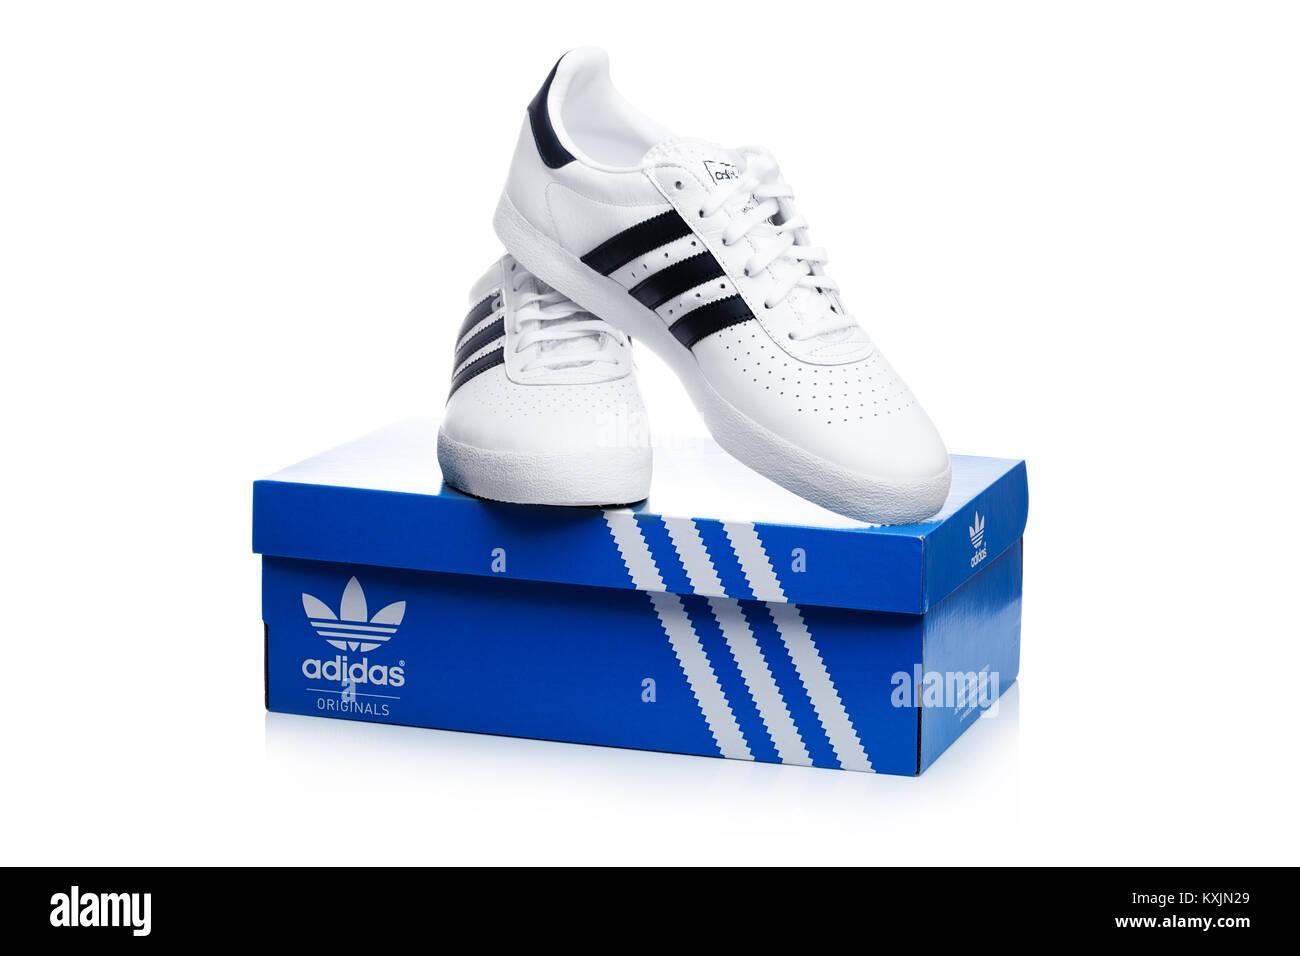 LONDON, Großbritannien 02 Januar, 2018: Adidas Originals